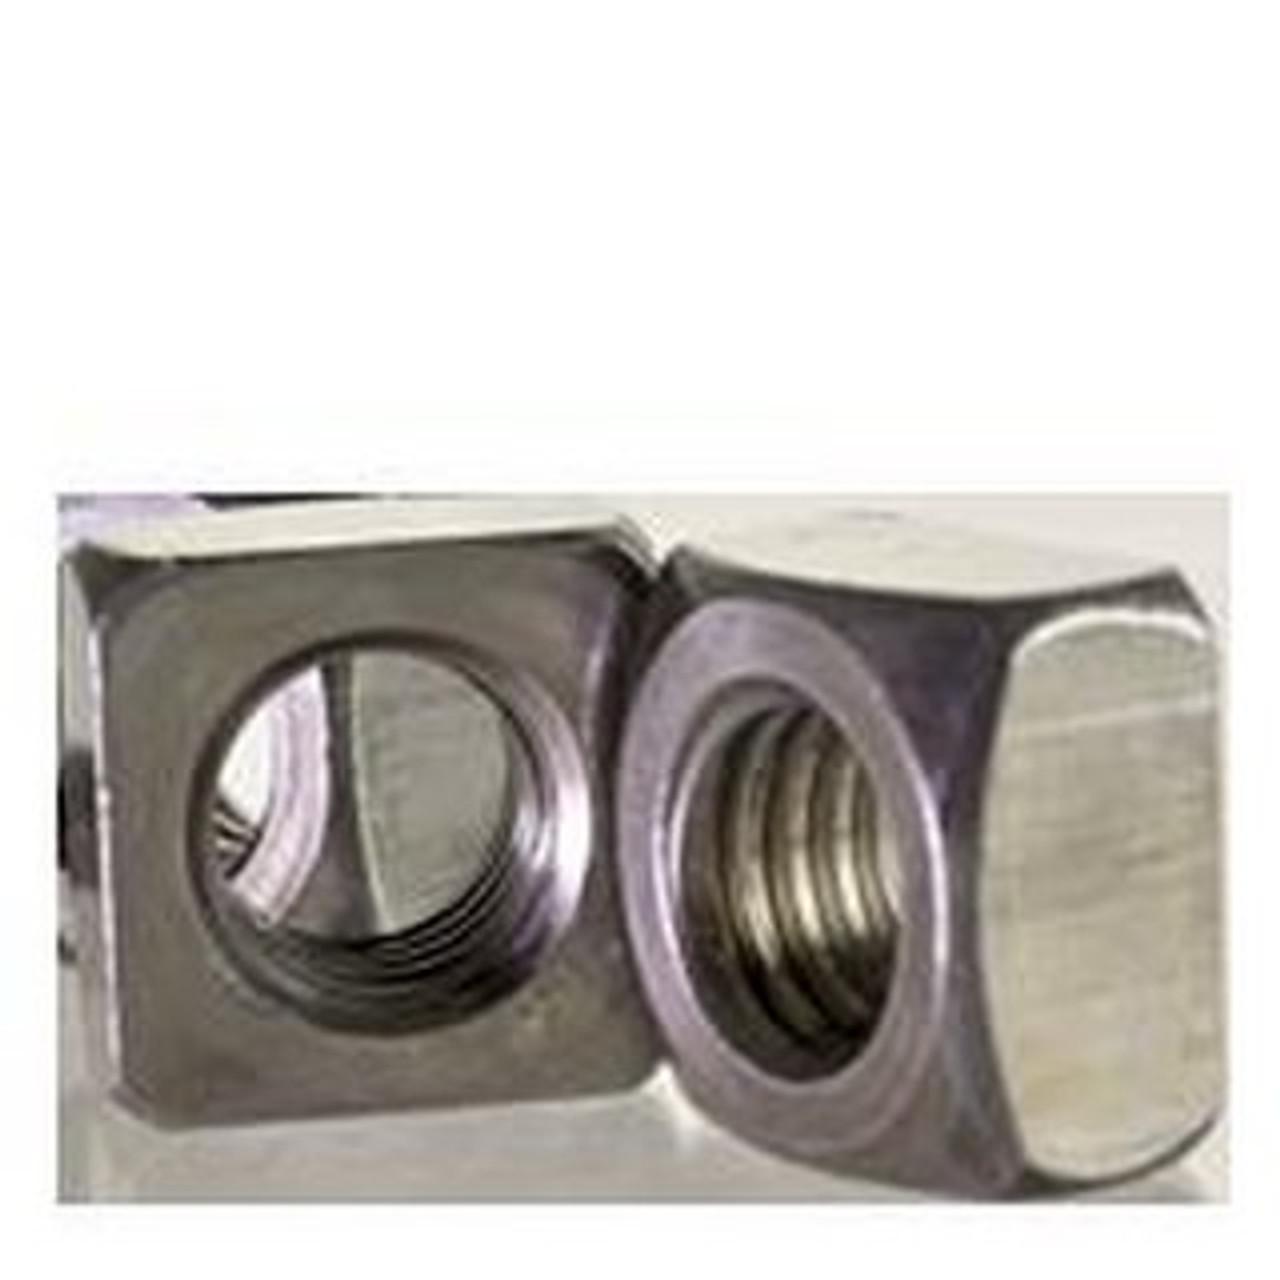 Grade 2 Steel Quantity: 2500 Plain 5//16-18 Square Nuts